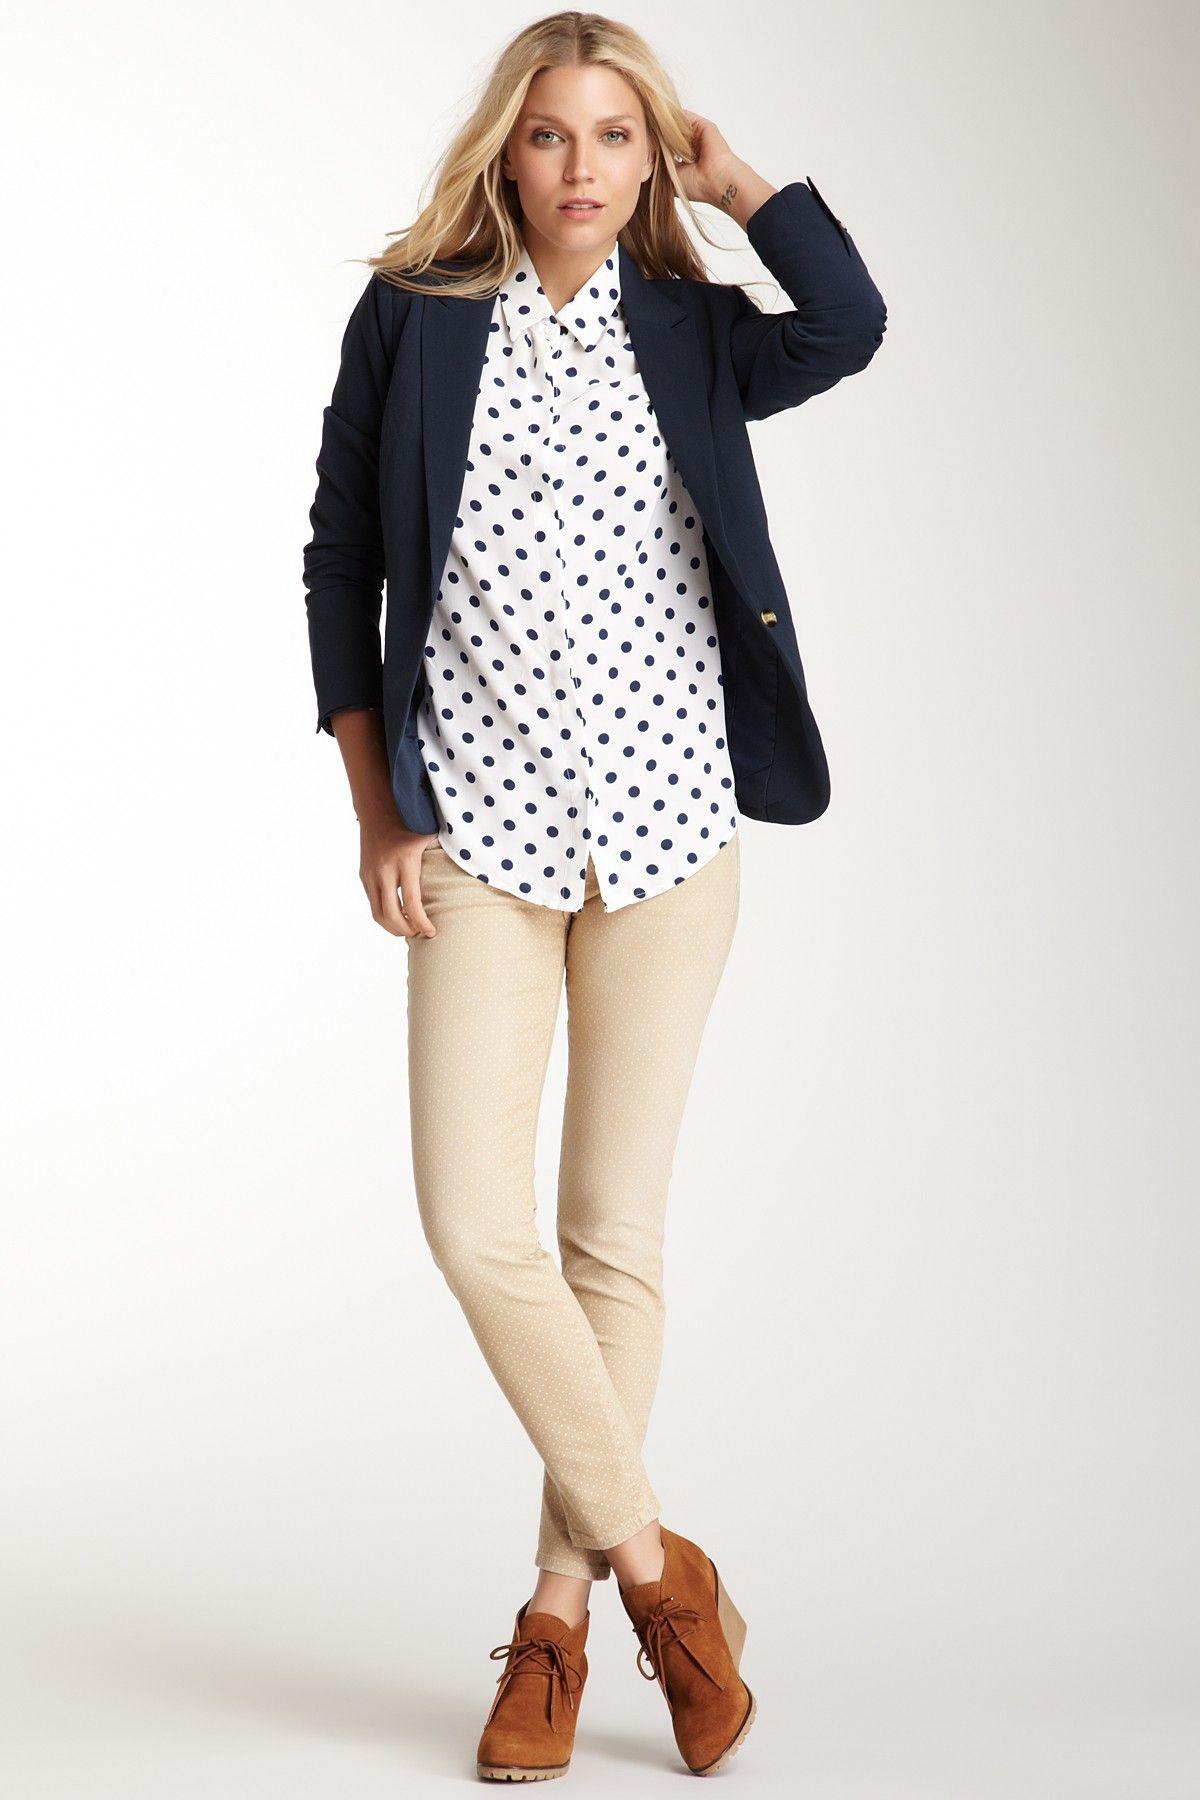 46 Khaki Pants ideas | khaki pants, fashion, my style